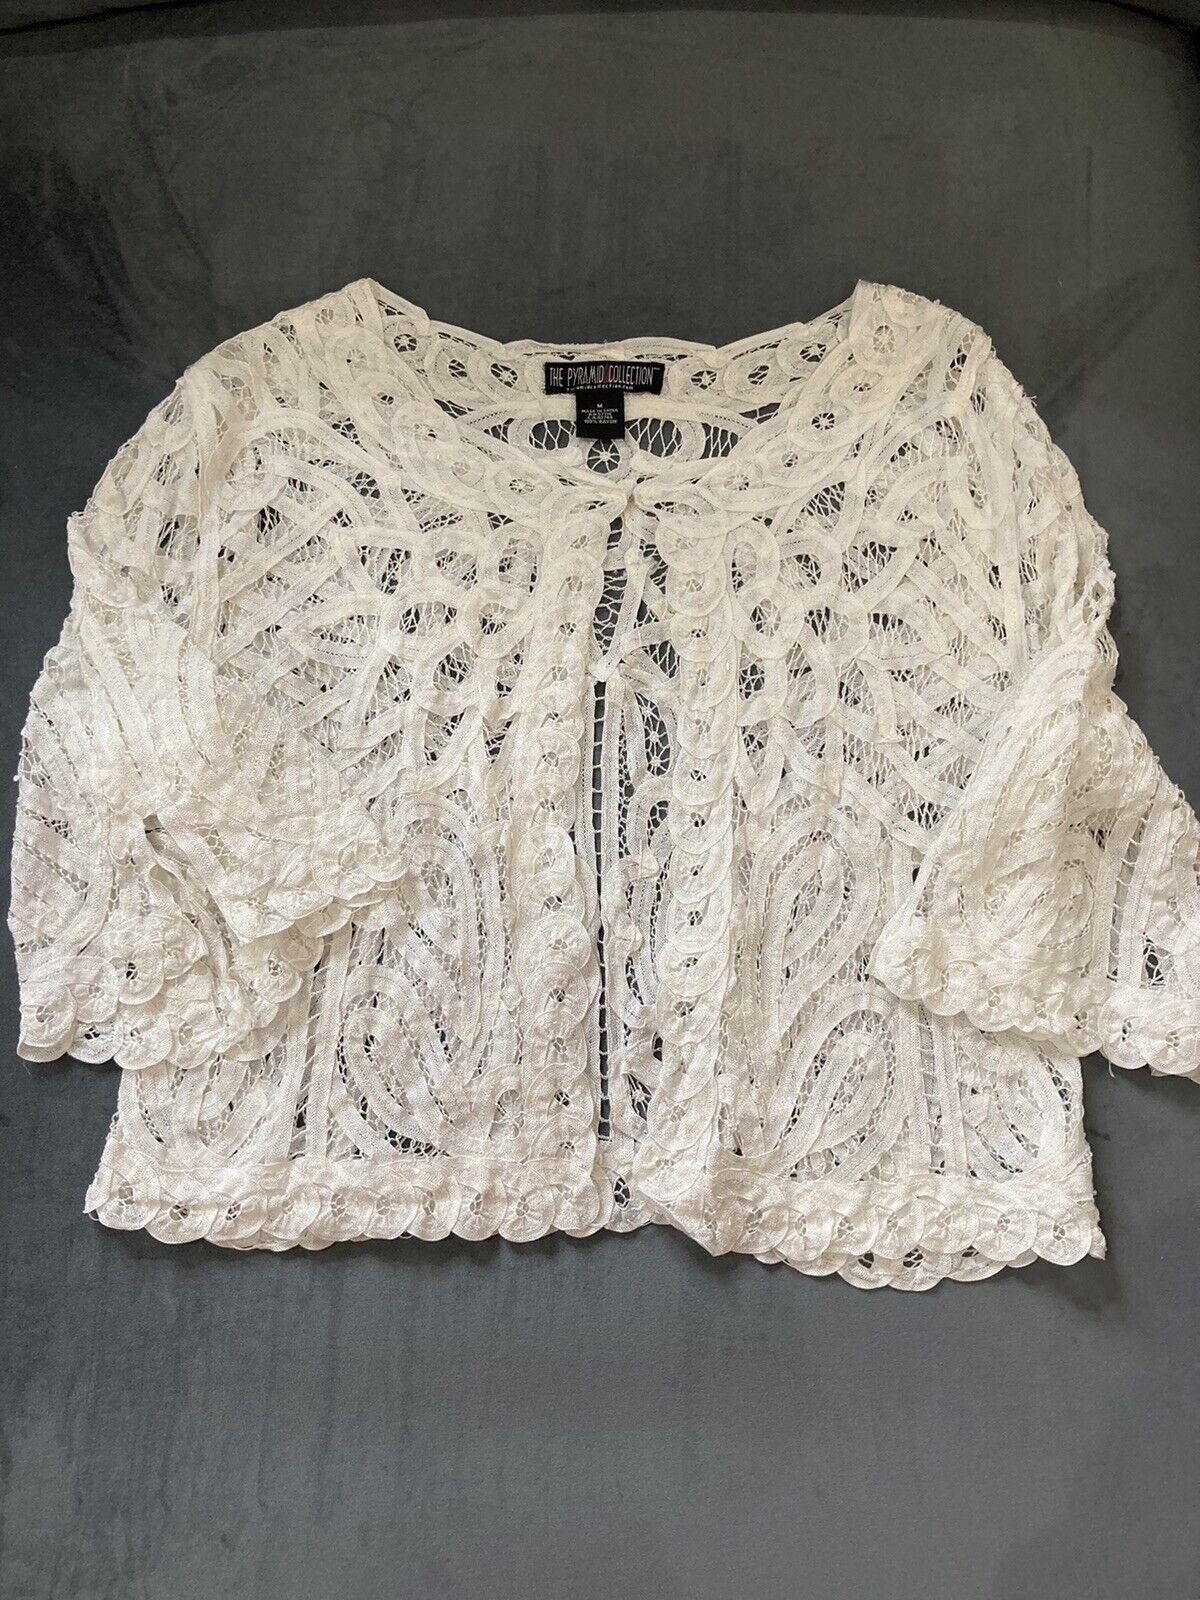 90s vintage fairycore bohemian crochet sweater - image 1